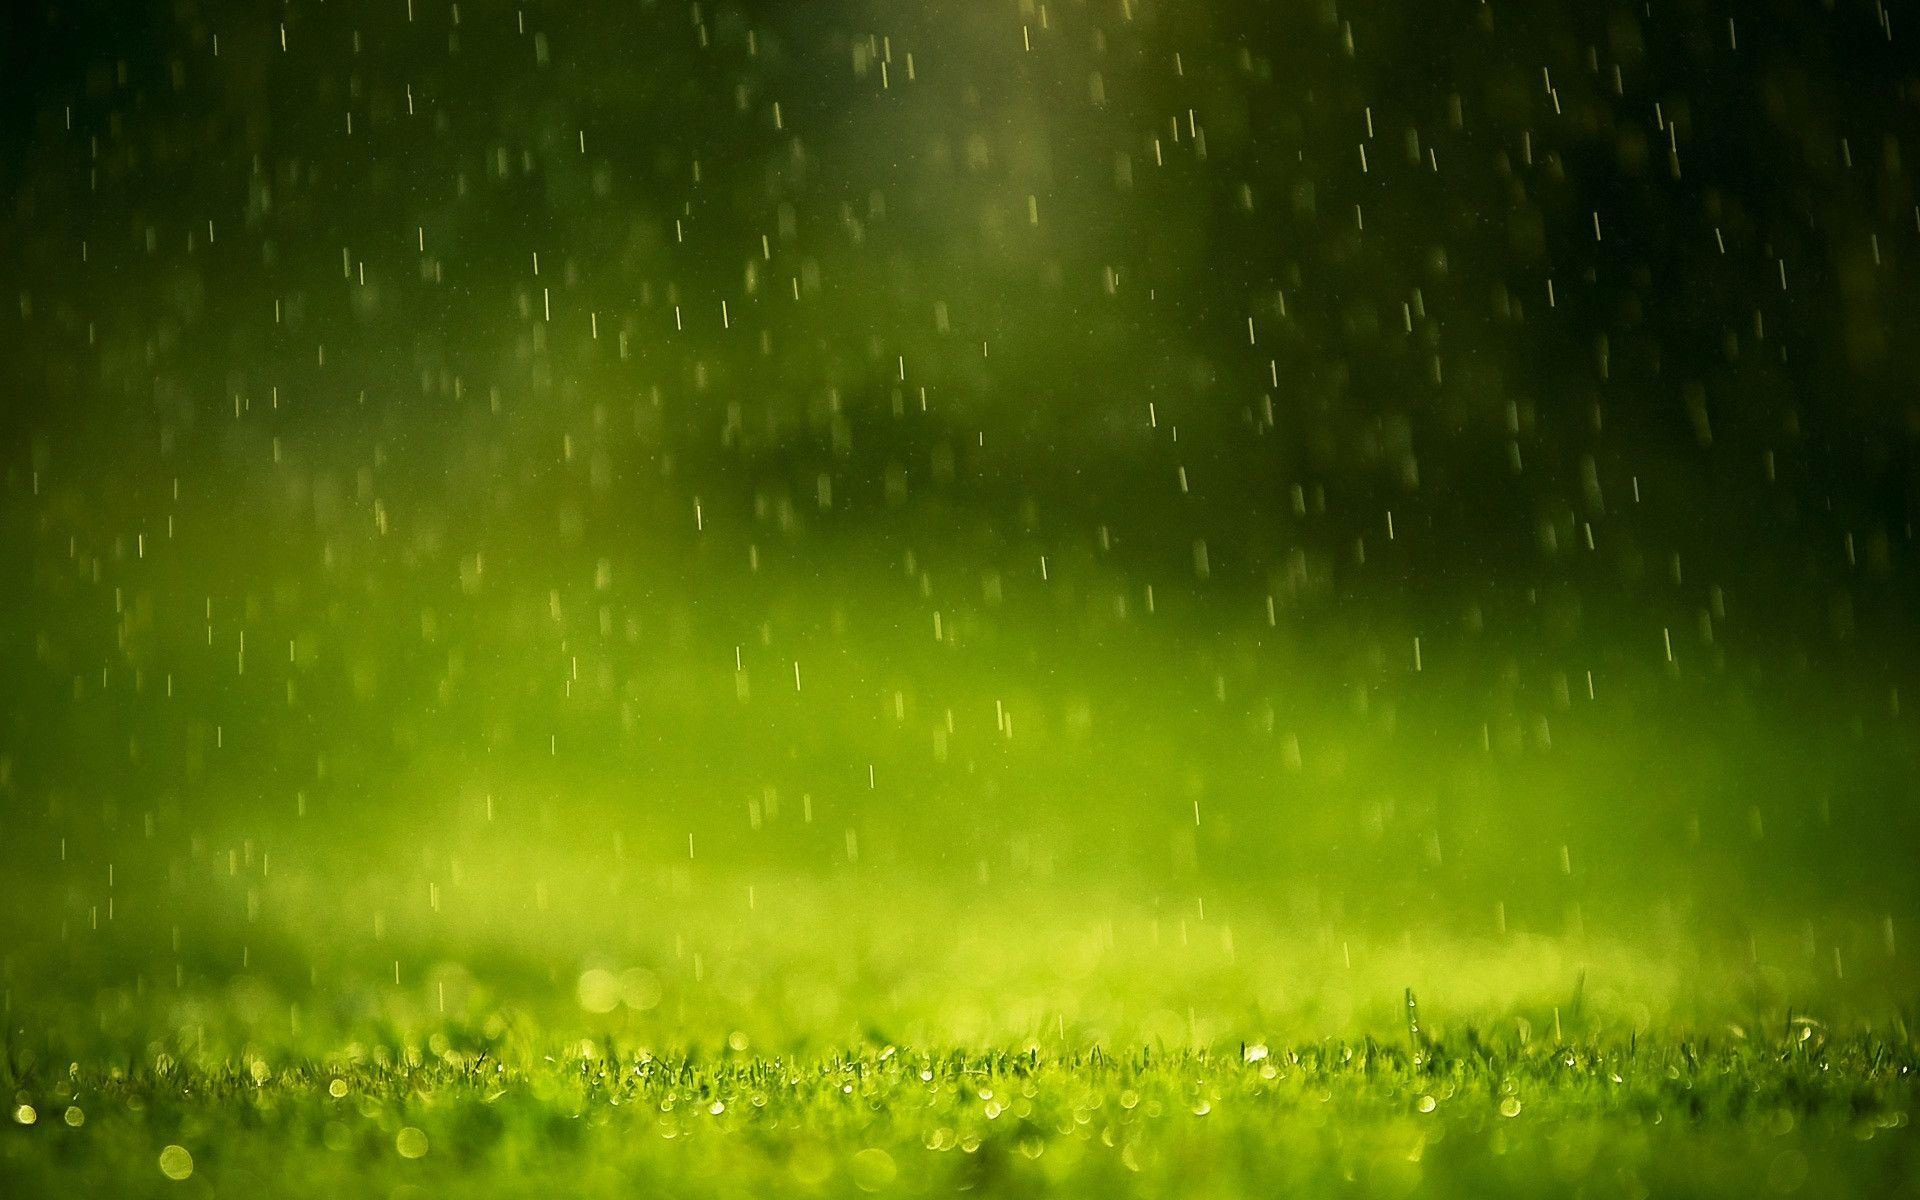 Rain Drops Wallpapers | HD Wallpapers